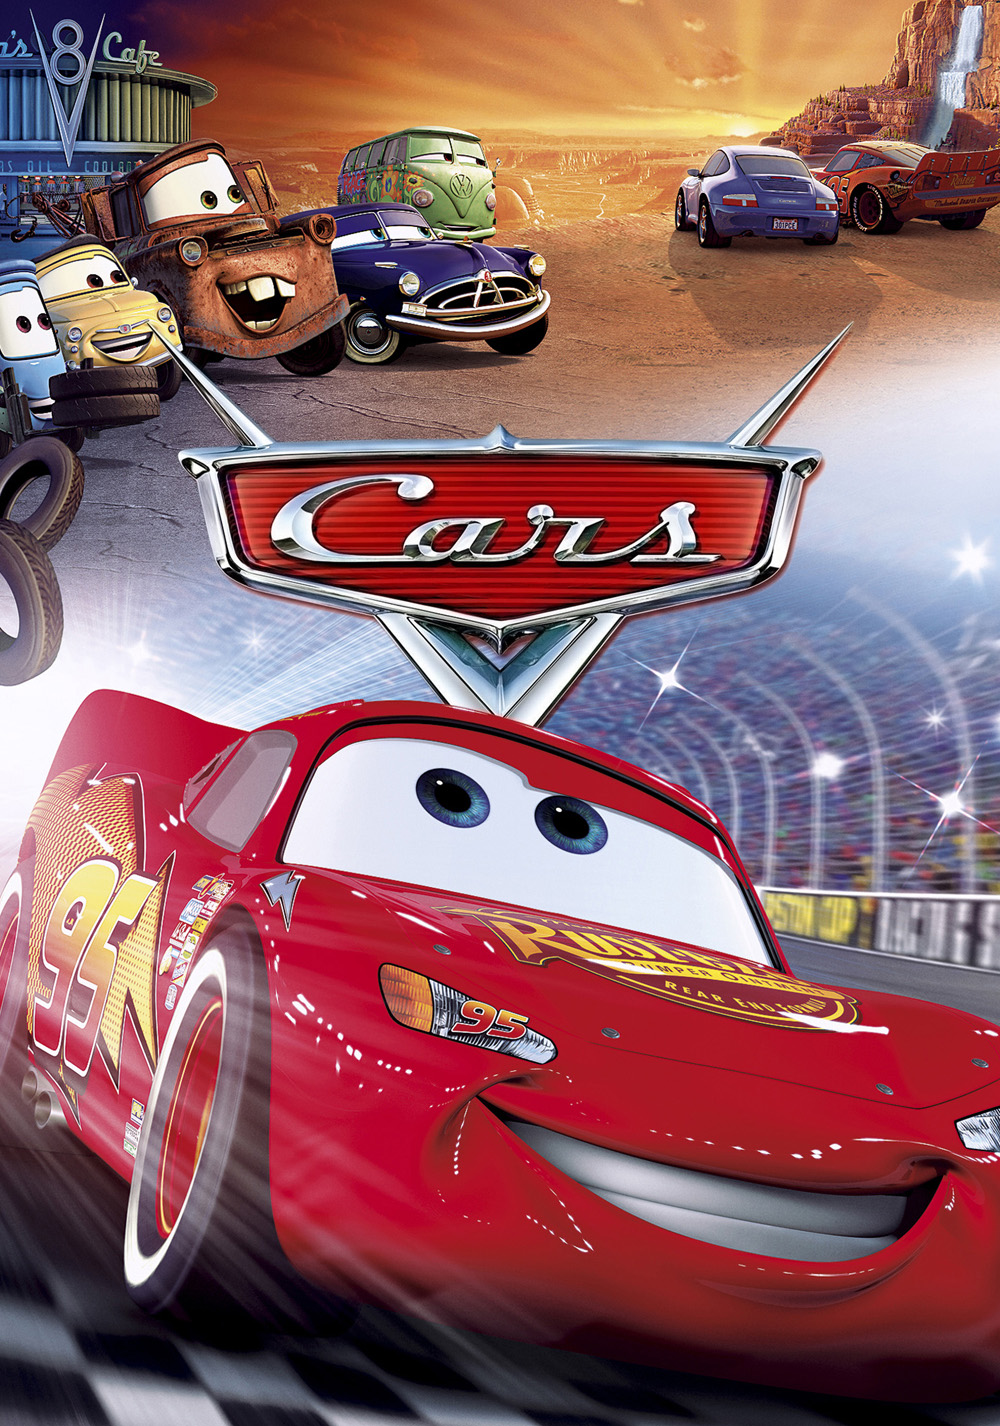 cars tv poster movies fanart pixar film mcqueen 2006 disney films posters dvd carros lightning race english